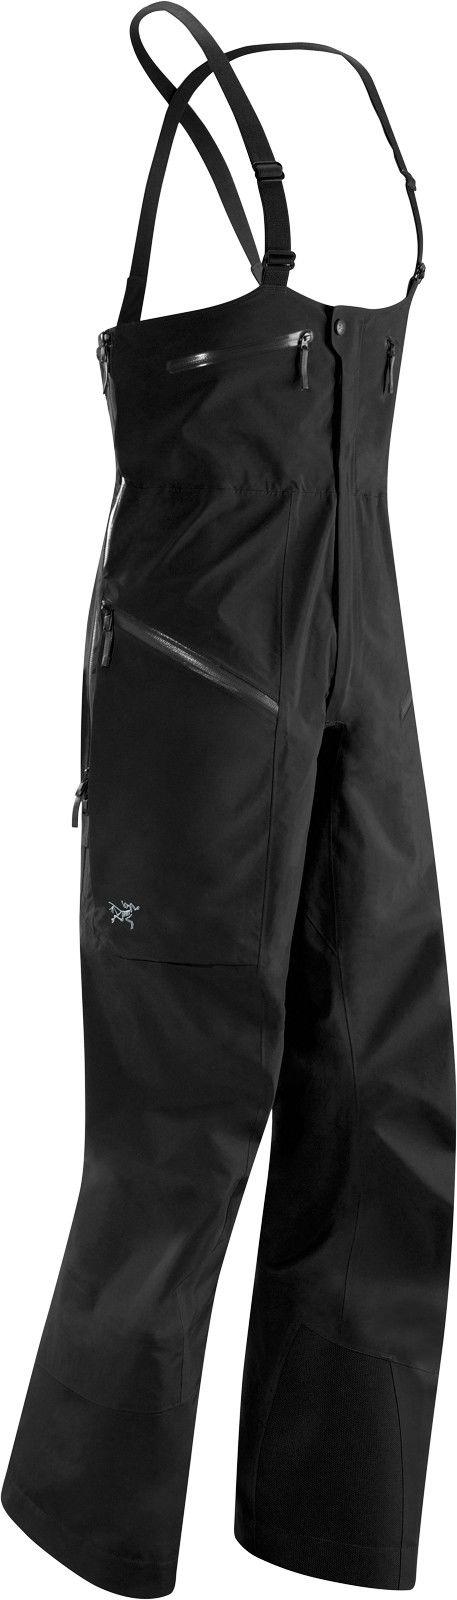 Arcteryx Stinger Bib Schwarz, Male Gore-Tex® Hose, L